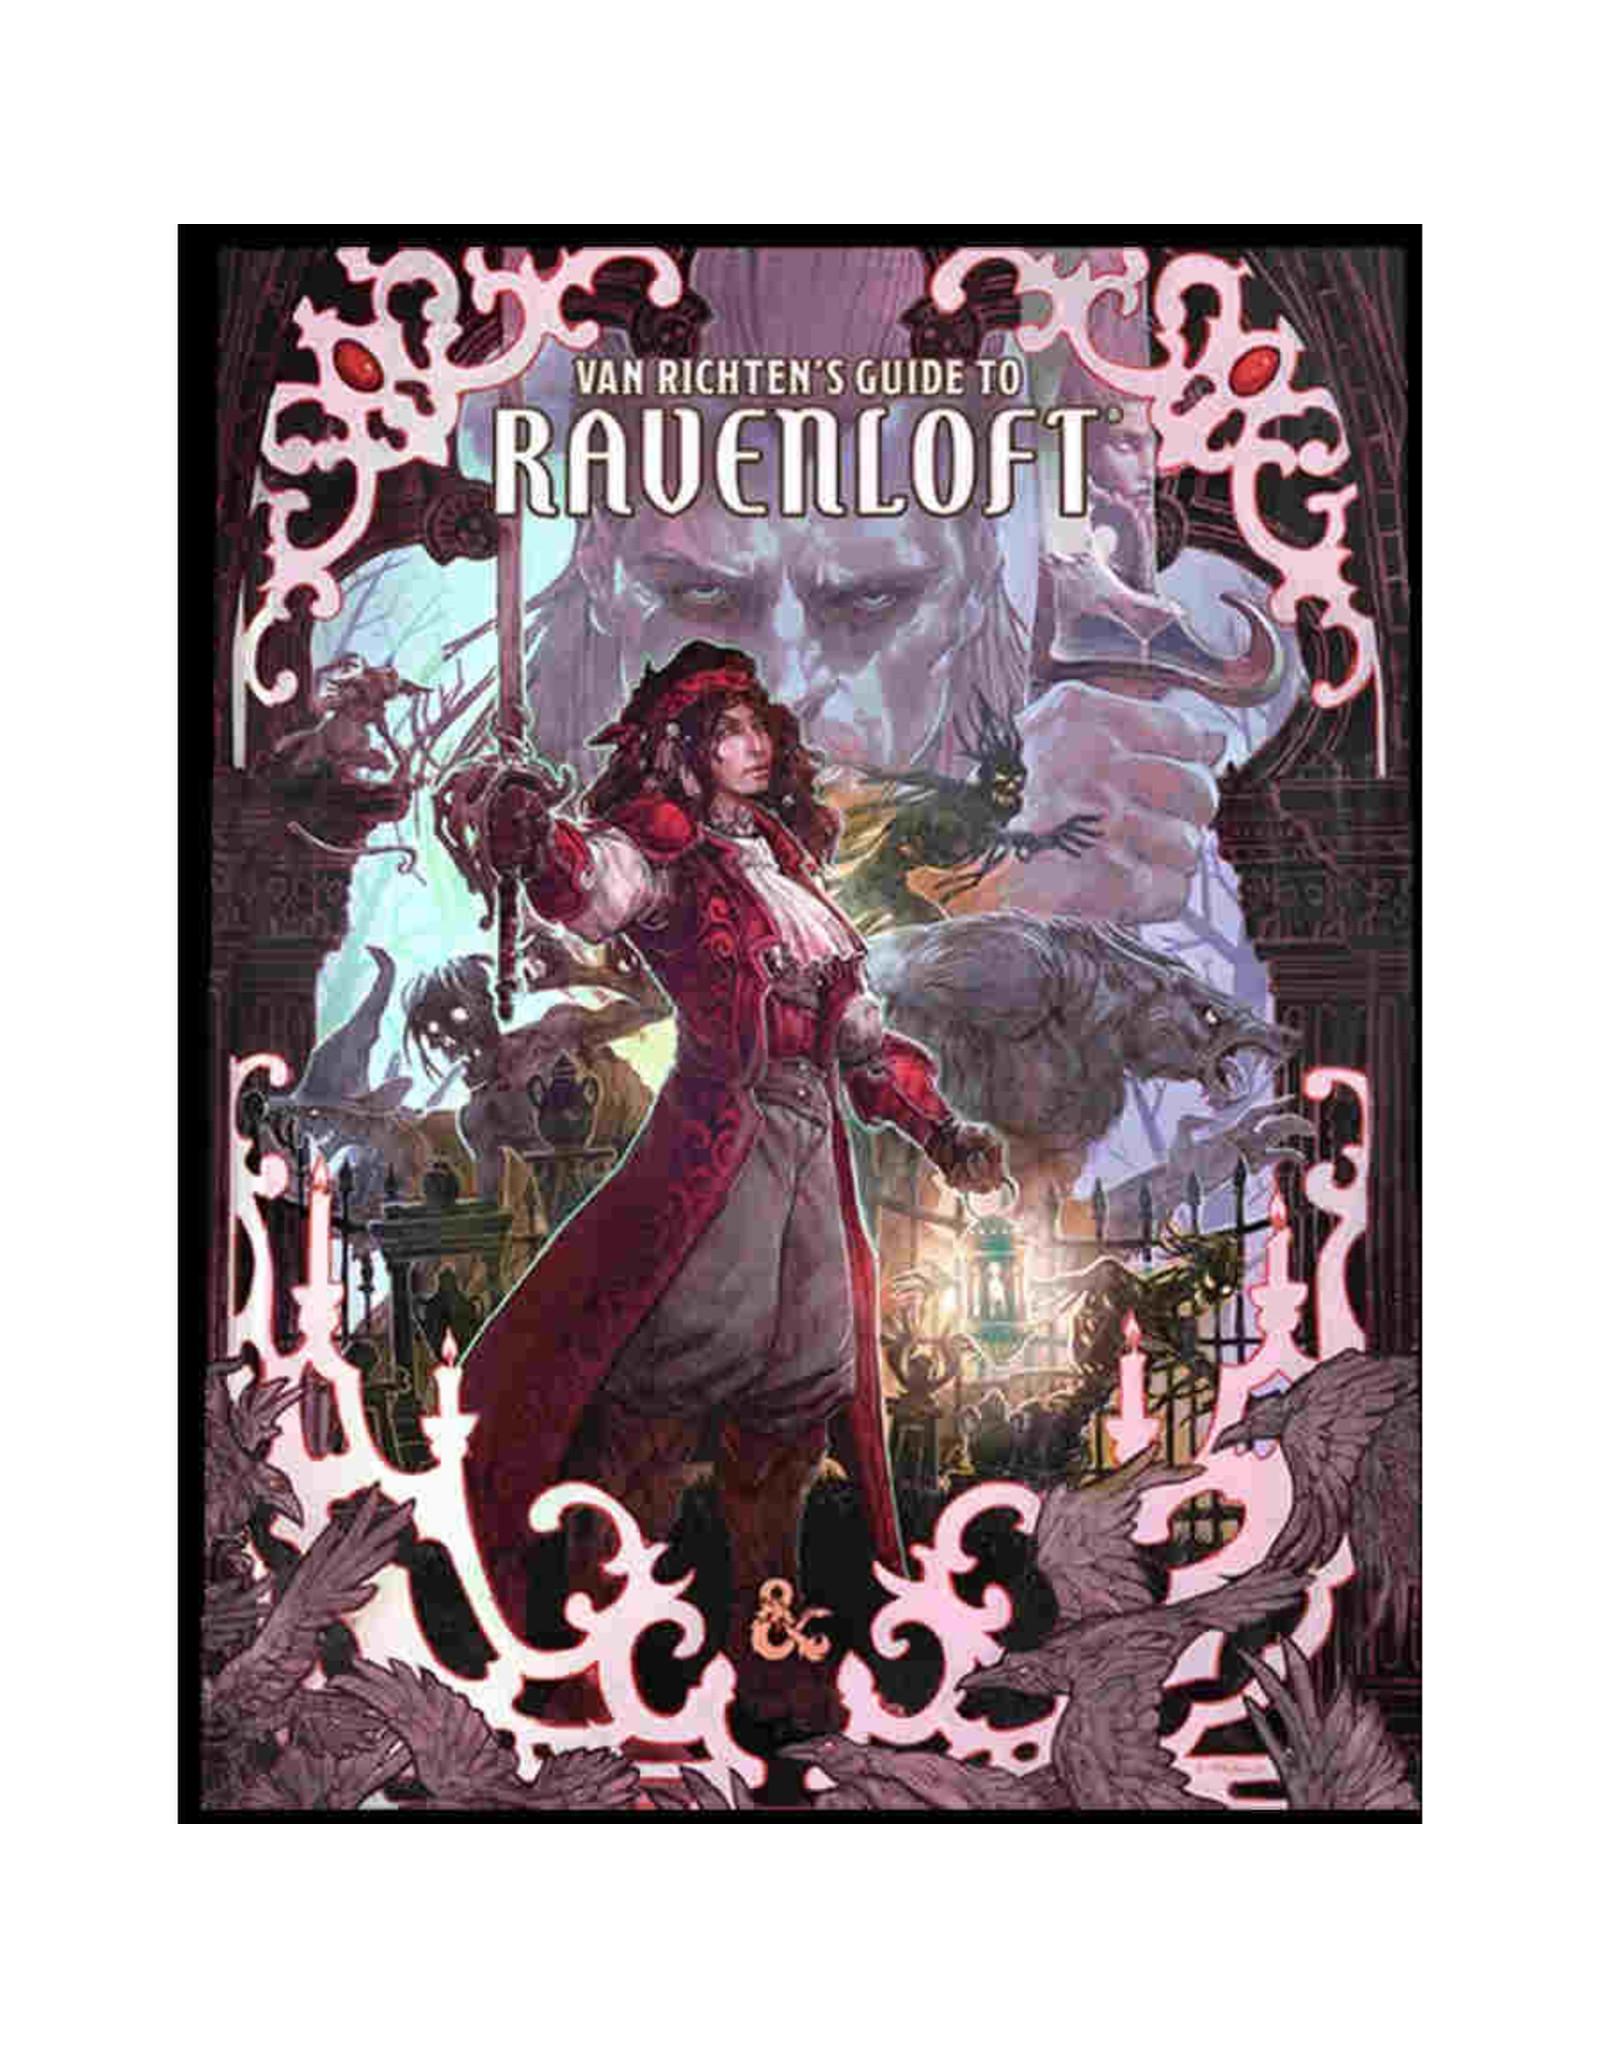 Wizards of the Coast D&D 5th Edition: Van Richten's Guide to Ravenloft Alternate Cover (LE)